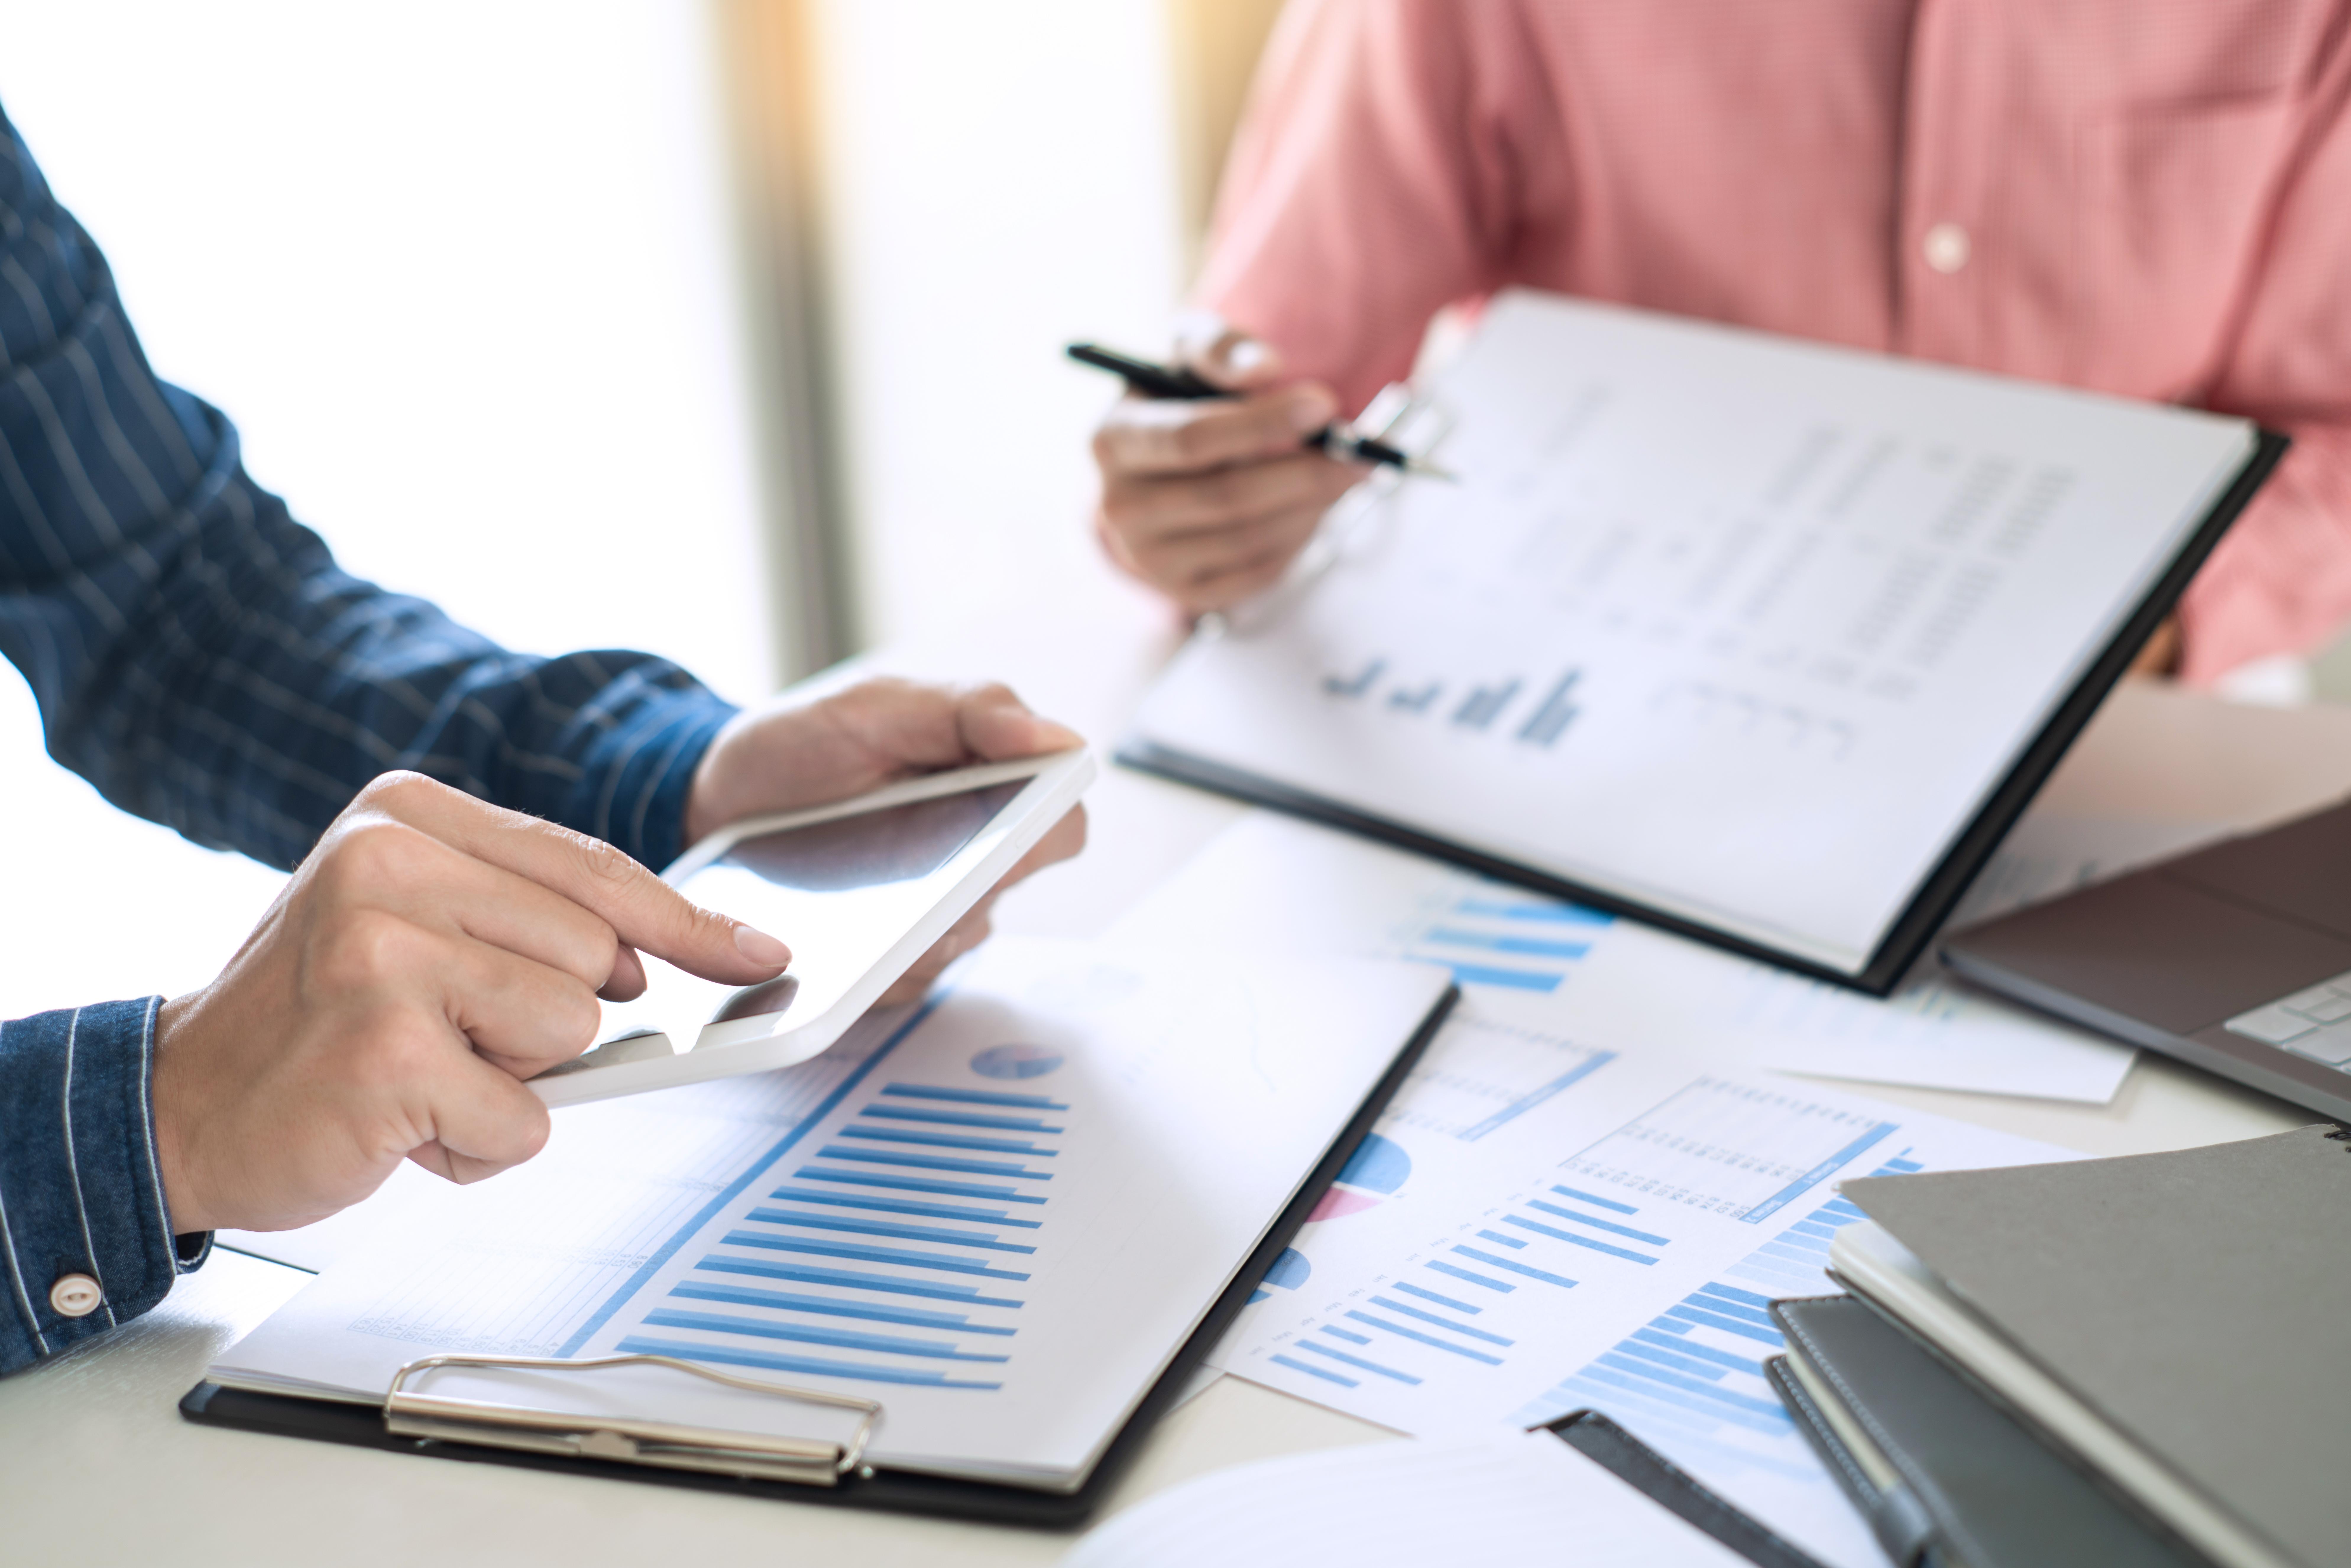 CXR Research: TA Department Structure & Funding